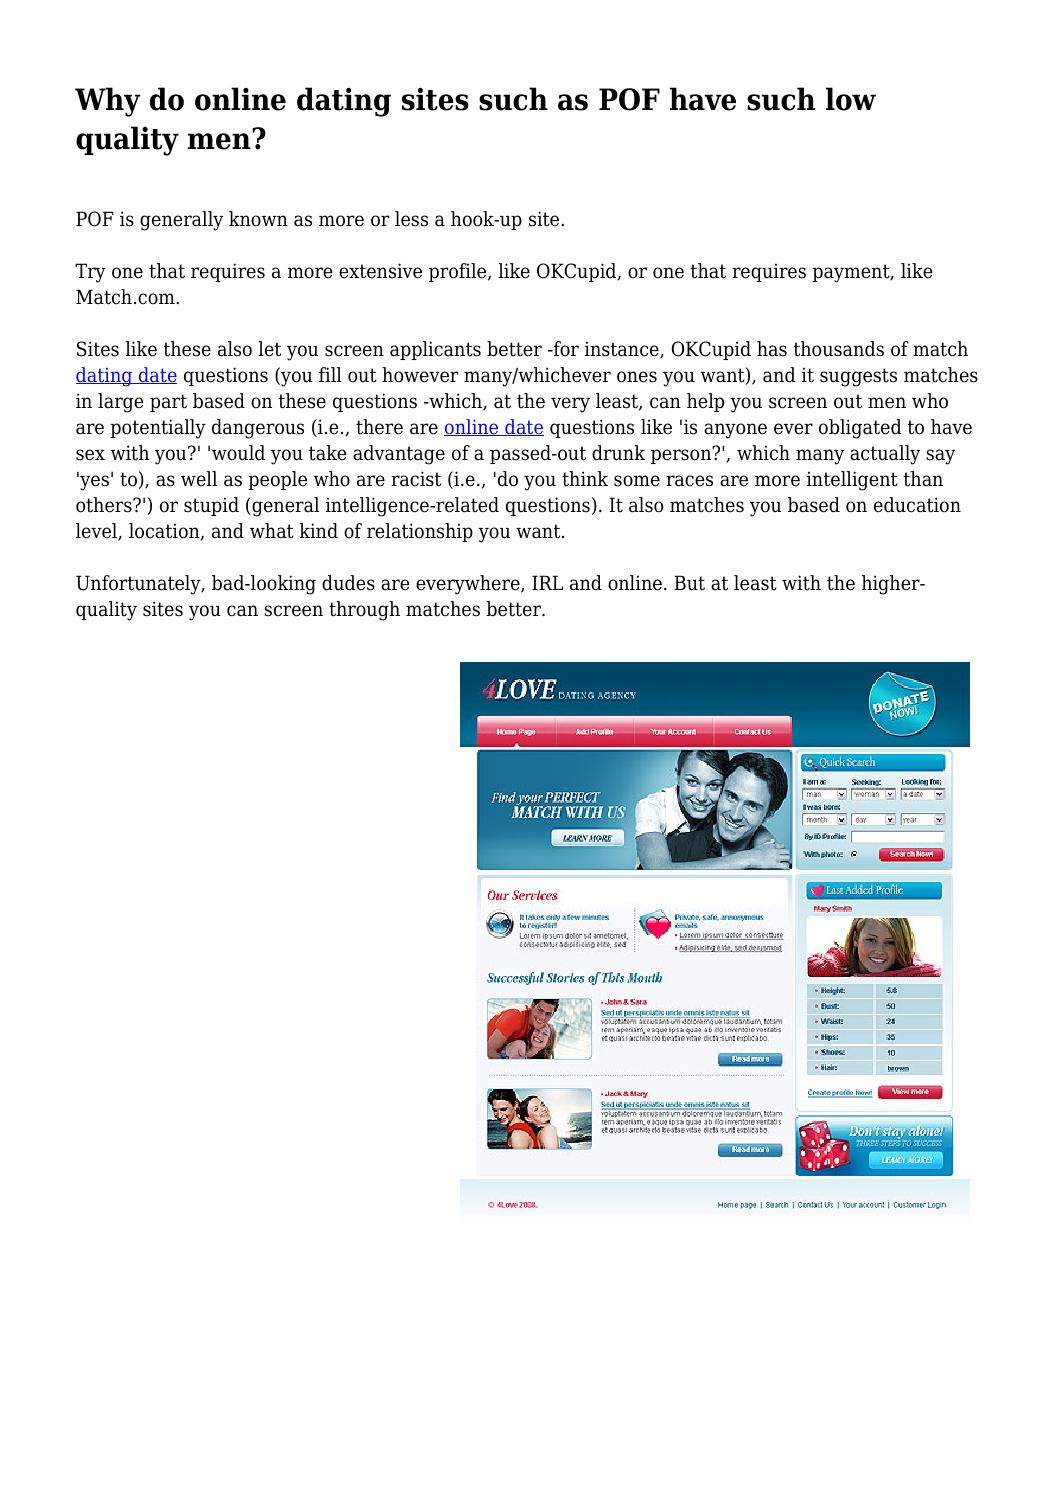 POF dating sites